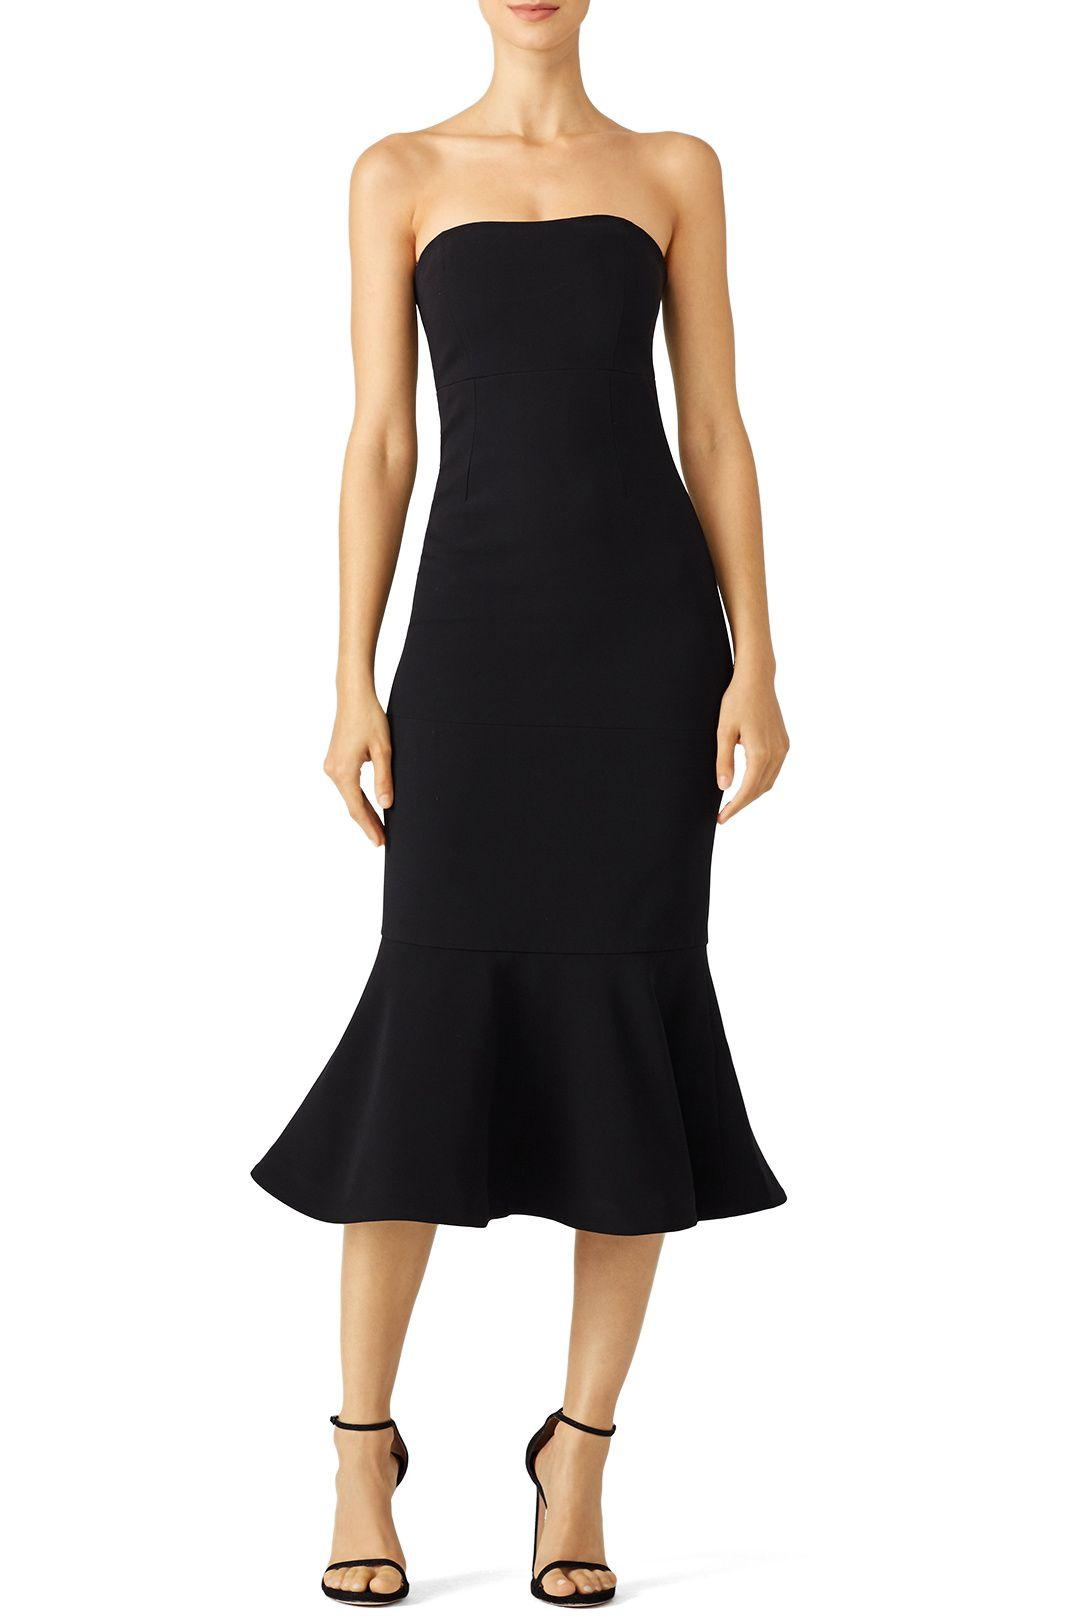 Rent wedding dresses  Rent Black Luna Dress by Cinq à Sept for    only at Rent the